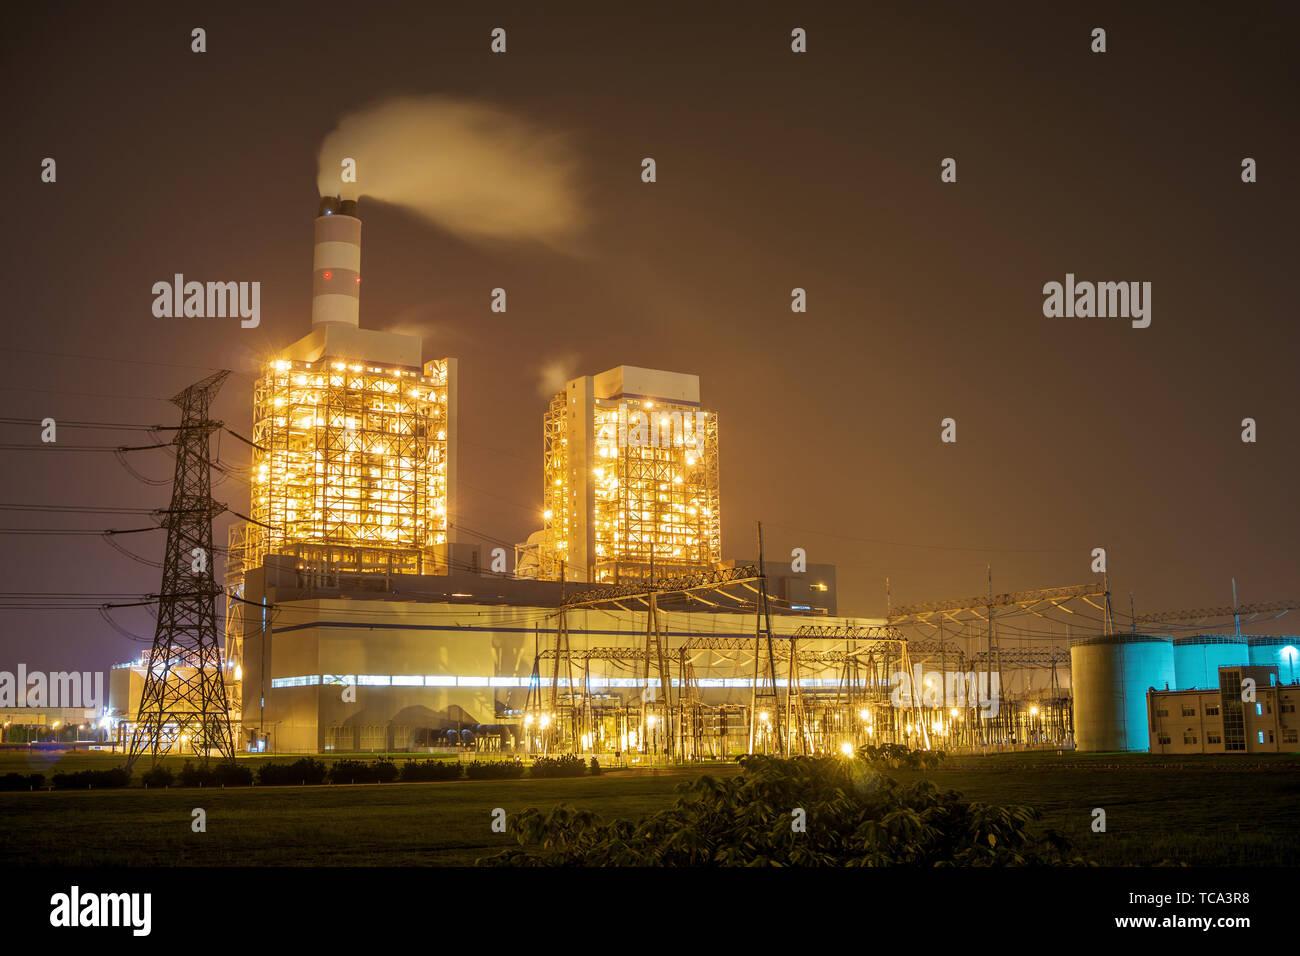 powerplant at night in yellow light - Stock Image